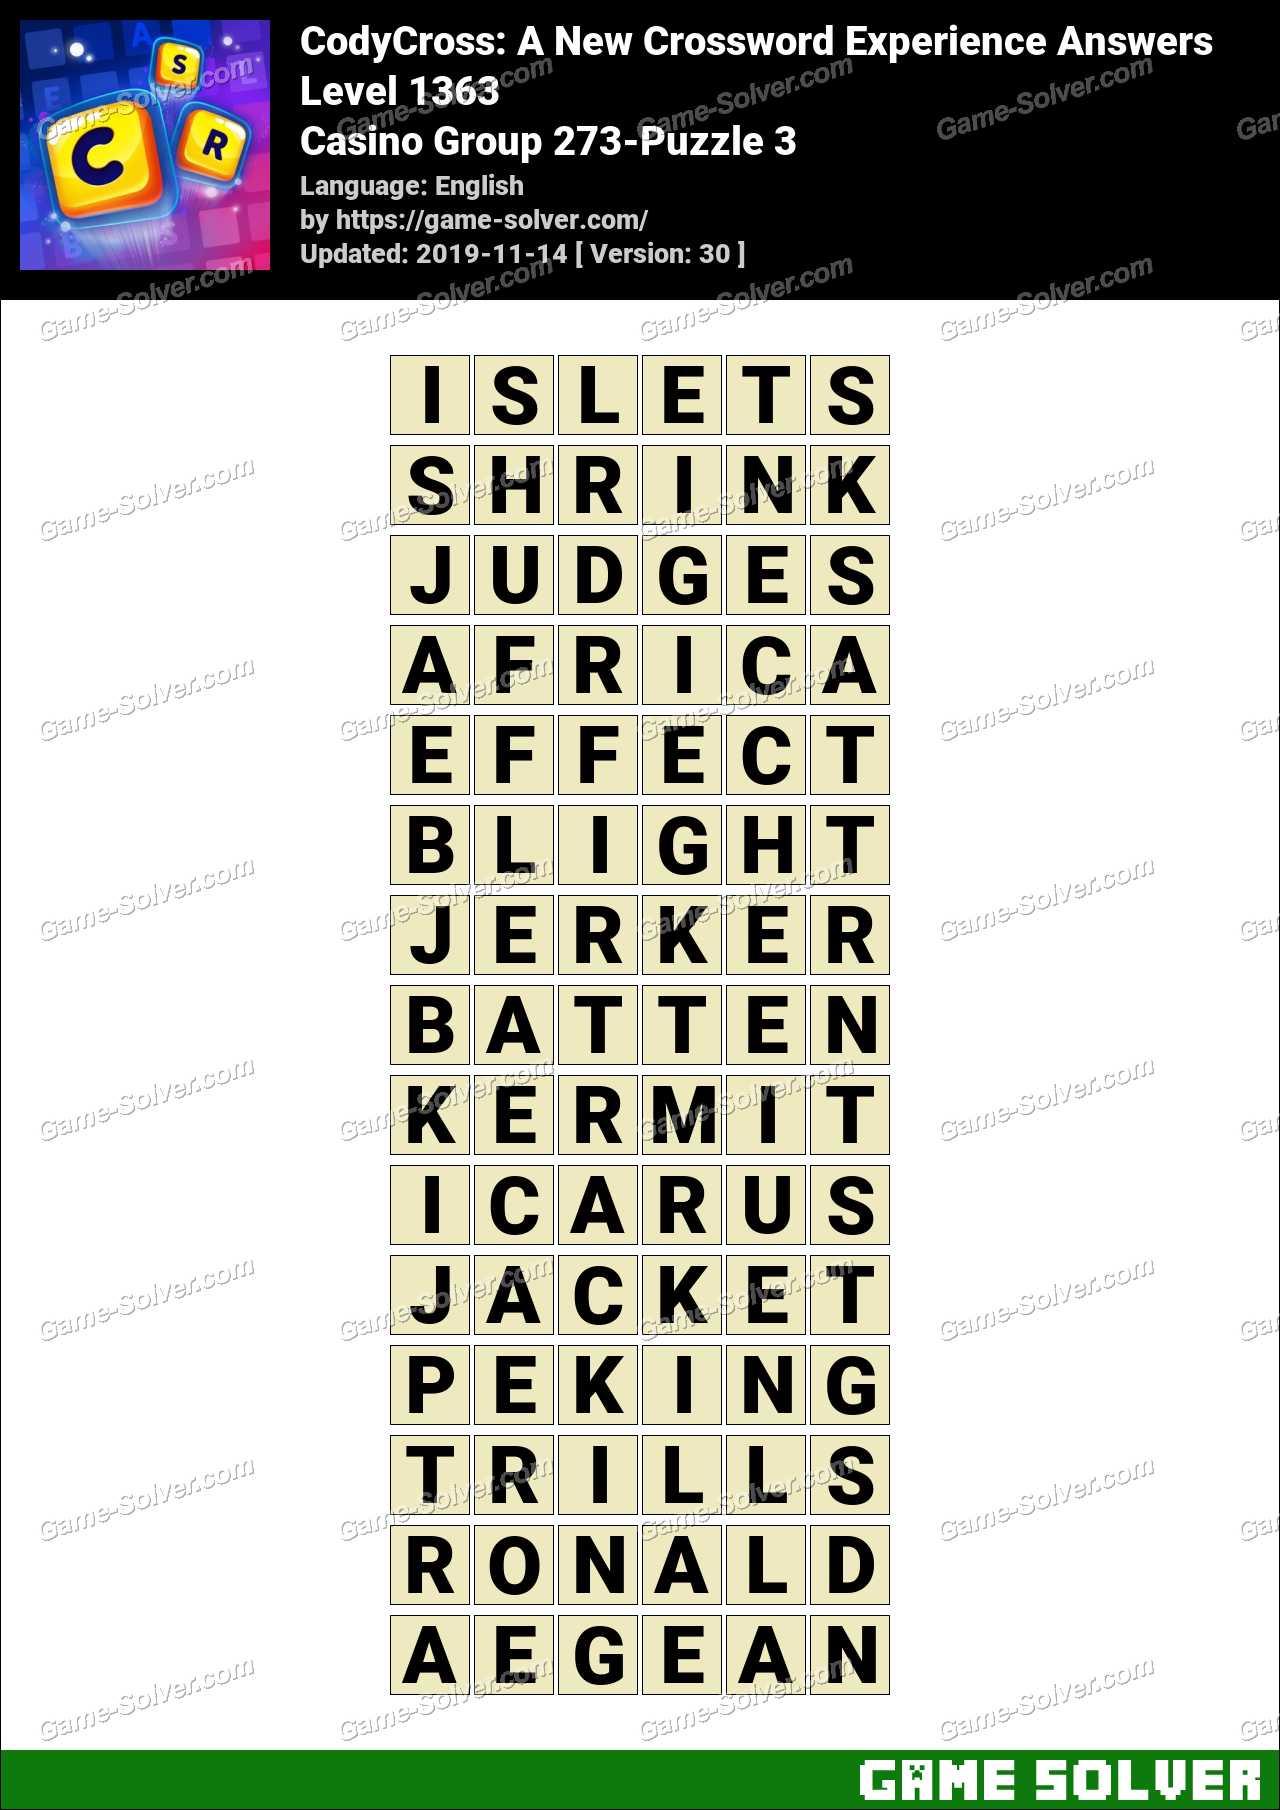 CodyCross Casino Group 273-Puzzle 3 Answers